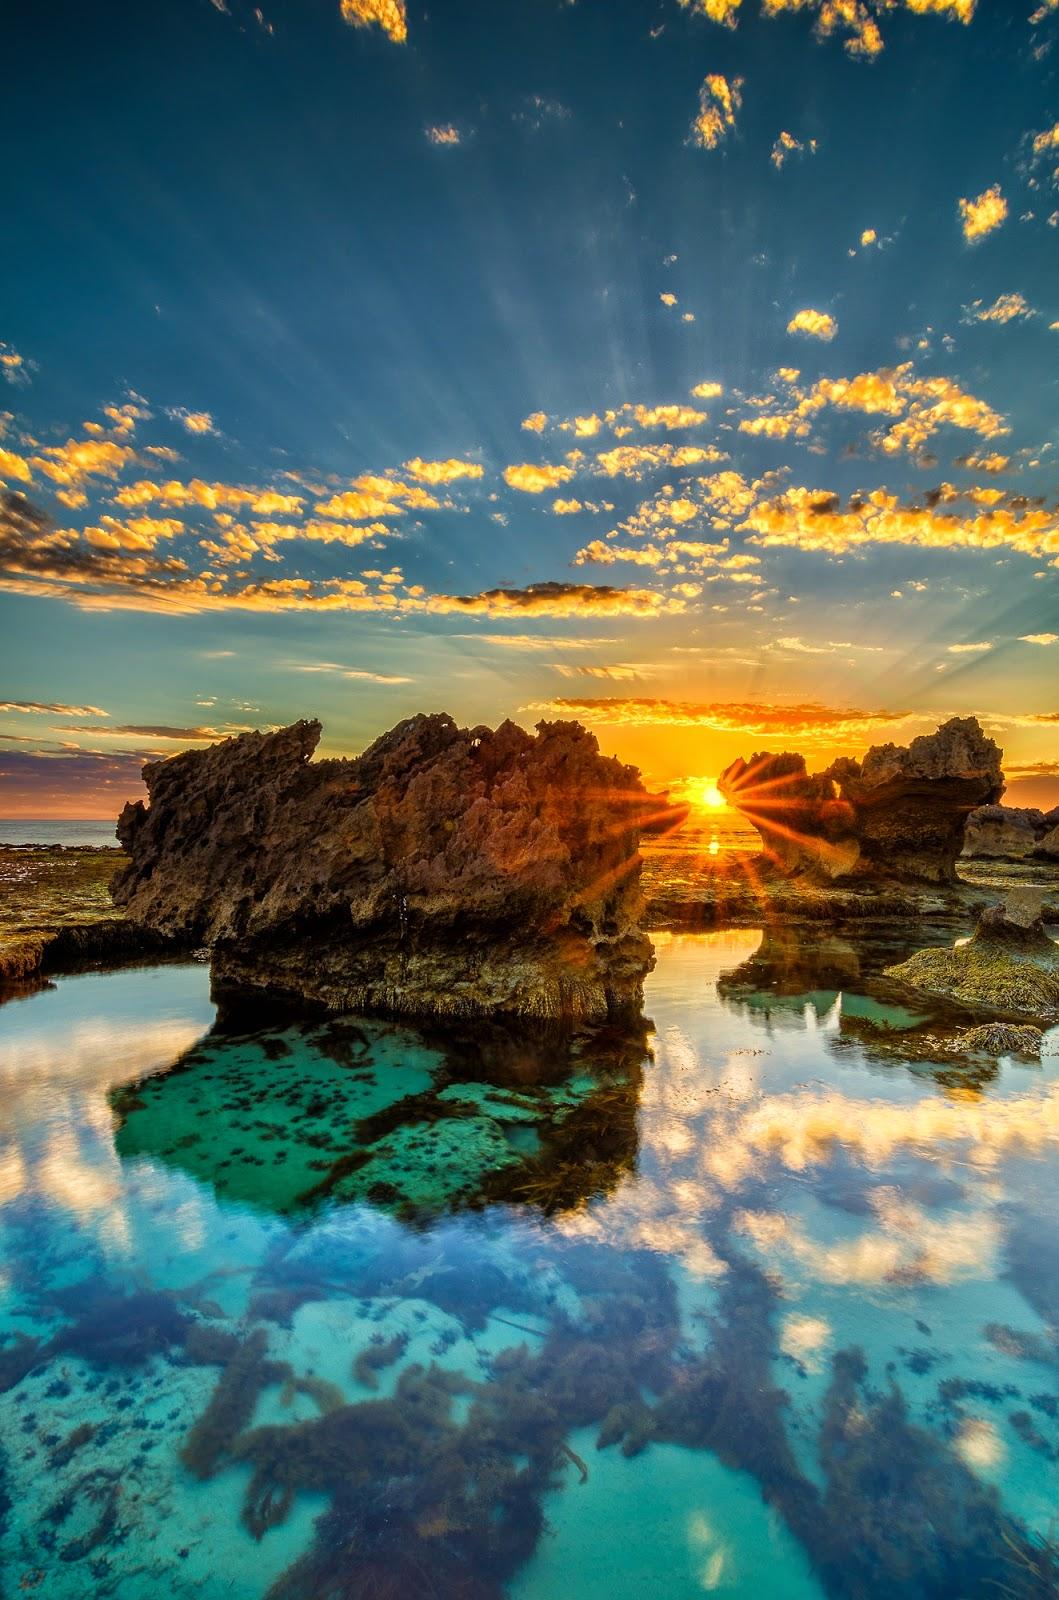 The Crags, Port Fairy, Victoria, Australia